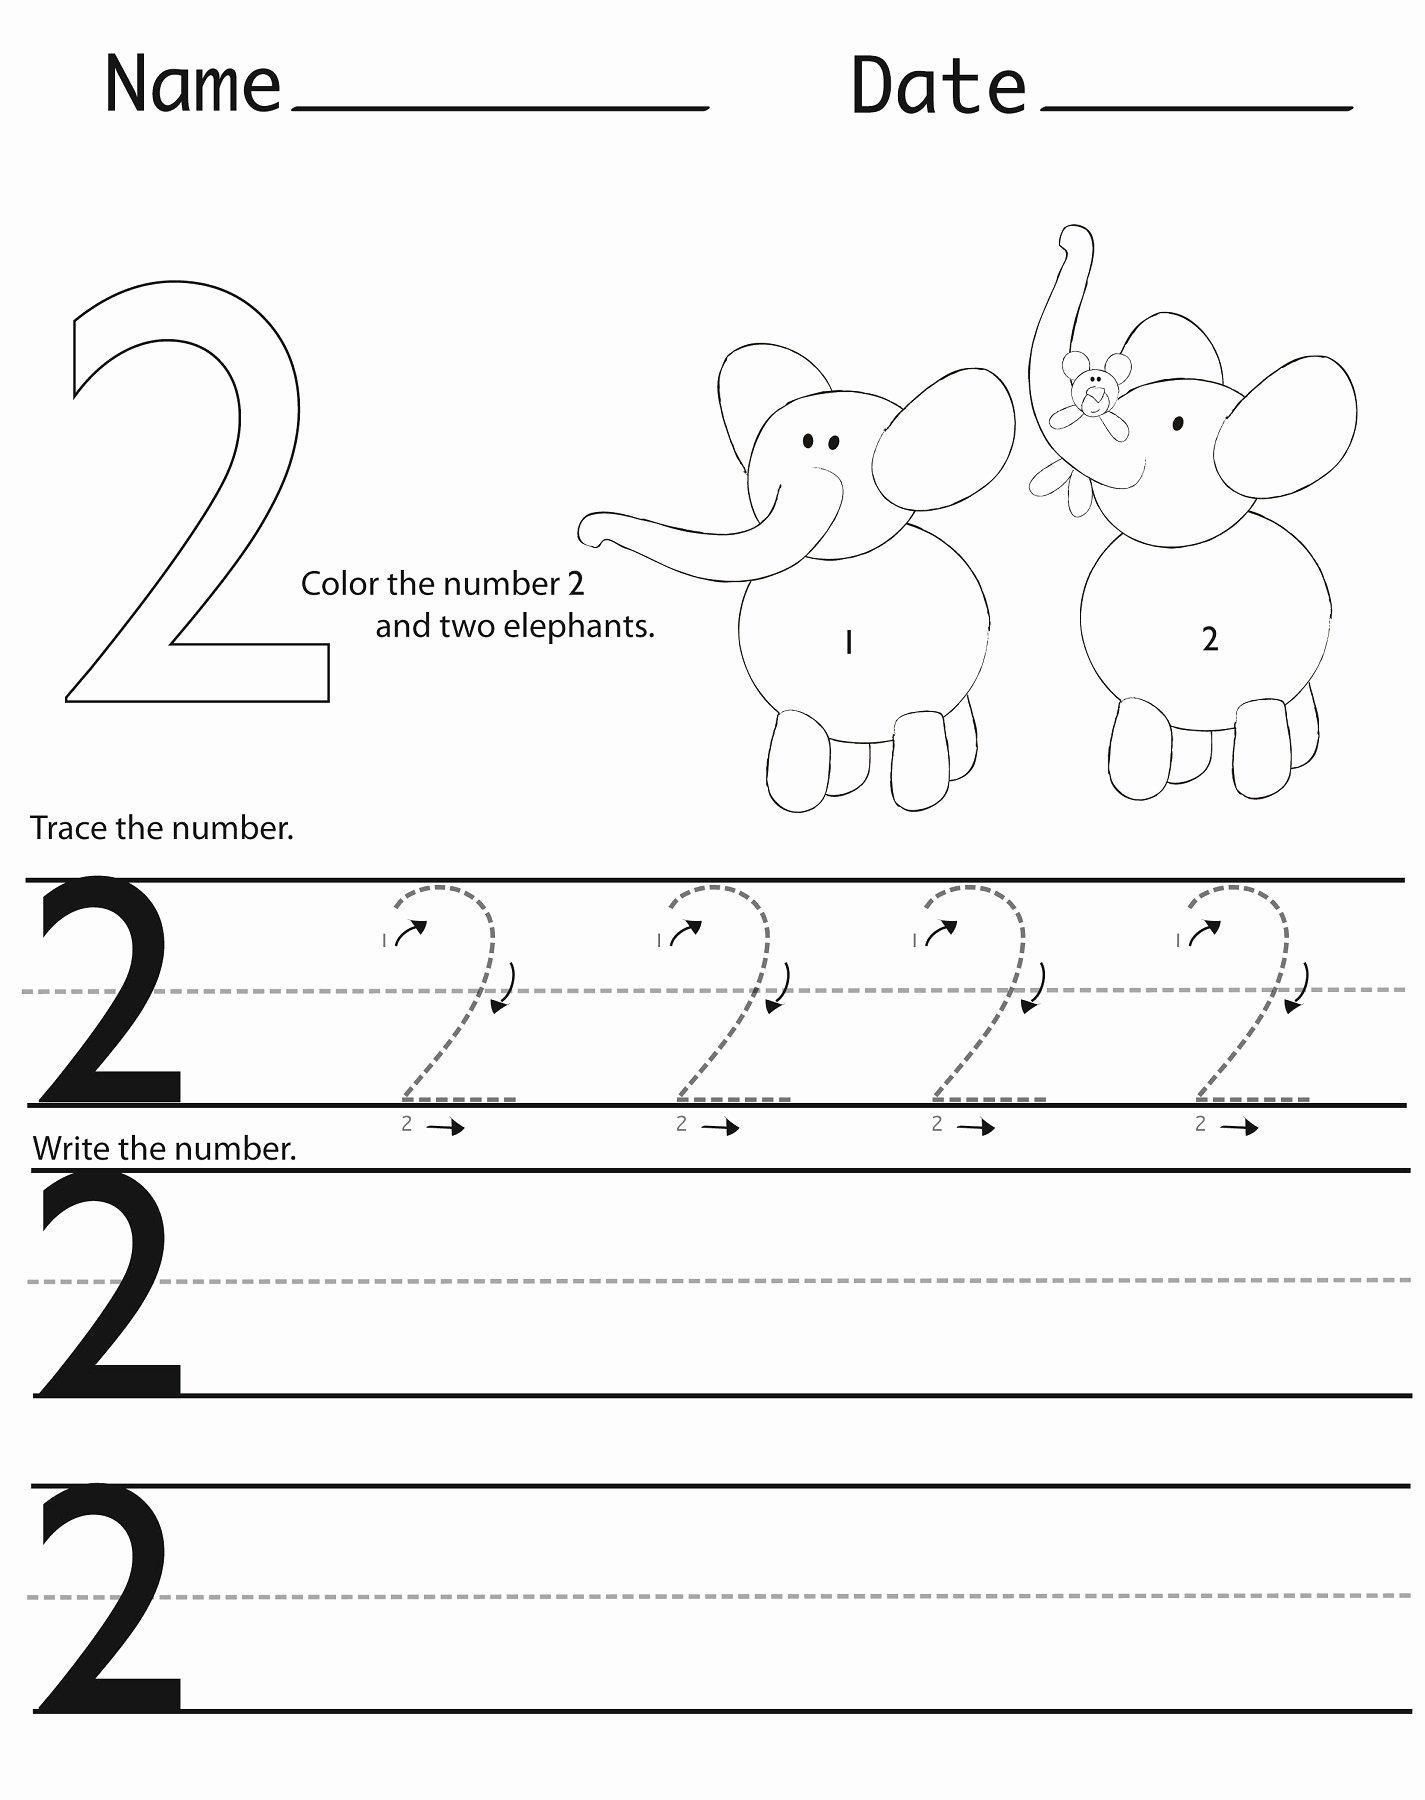 Number 2 Worksheets for Preschoolers Awesome Writing Numbers Worksheets Printable